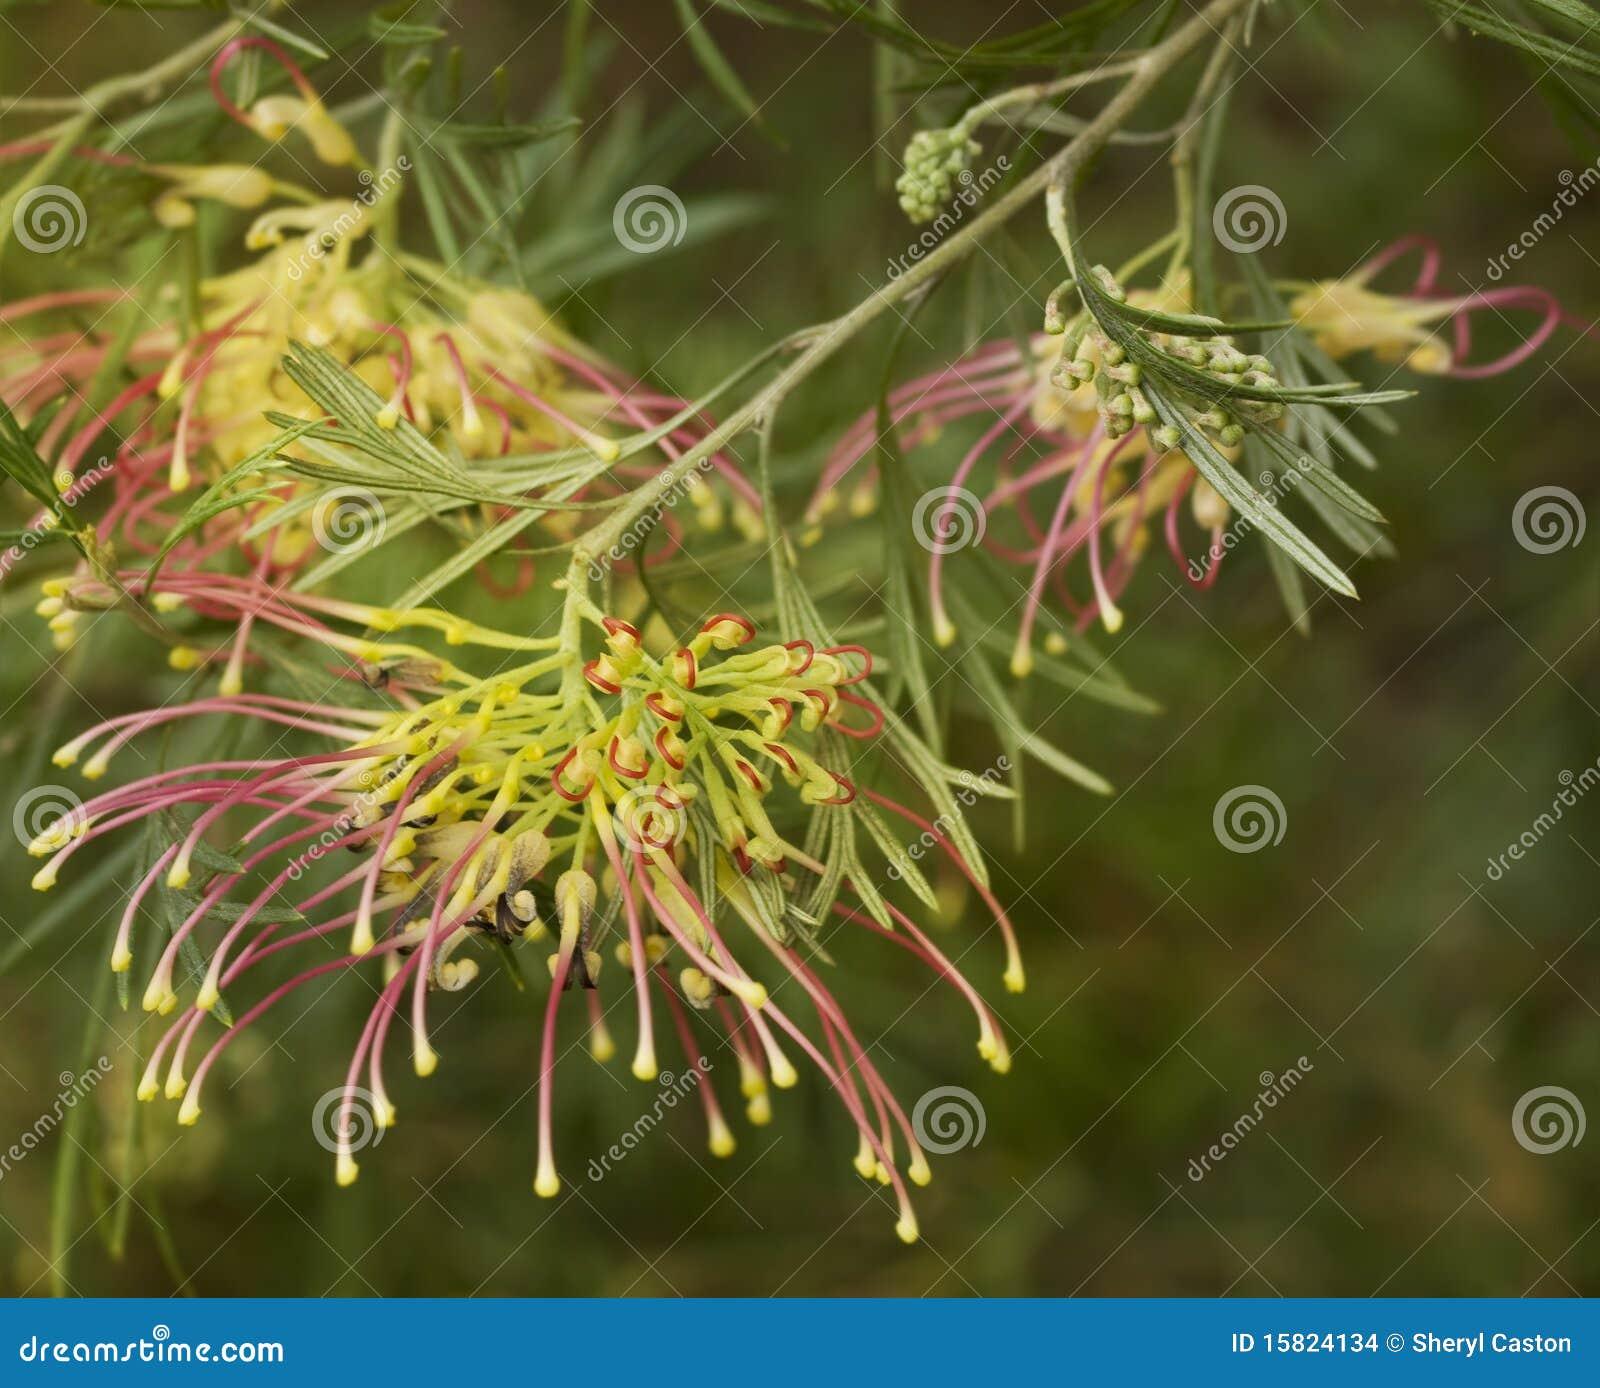 Green Gem Asparagus: Spring Flower Grevillea Winpara Gem Shrub Stock Images